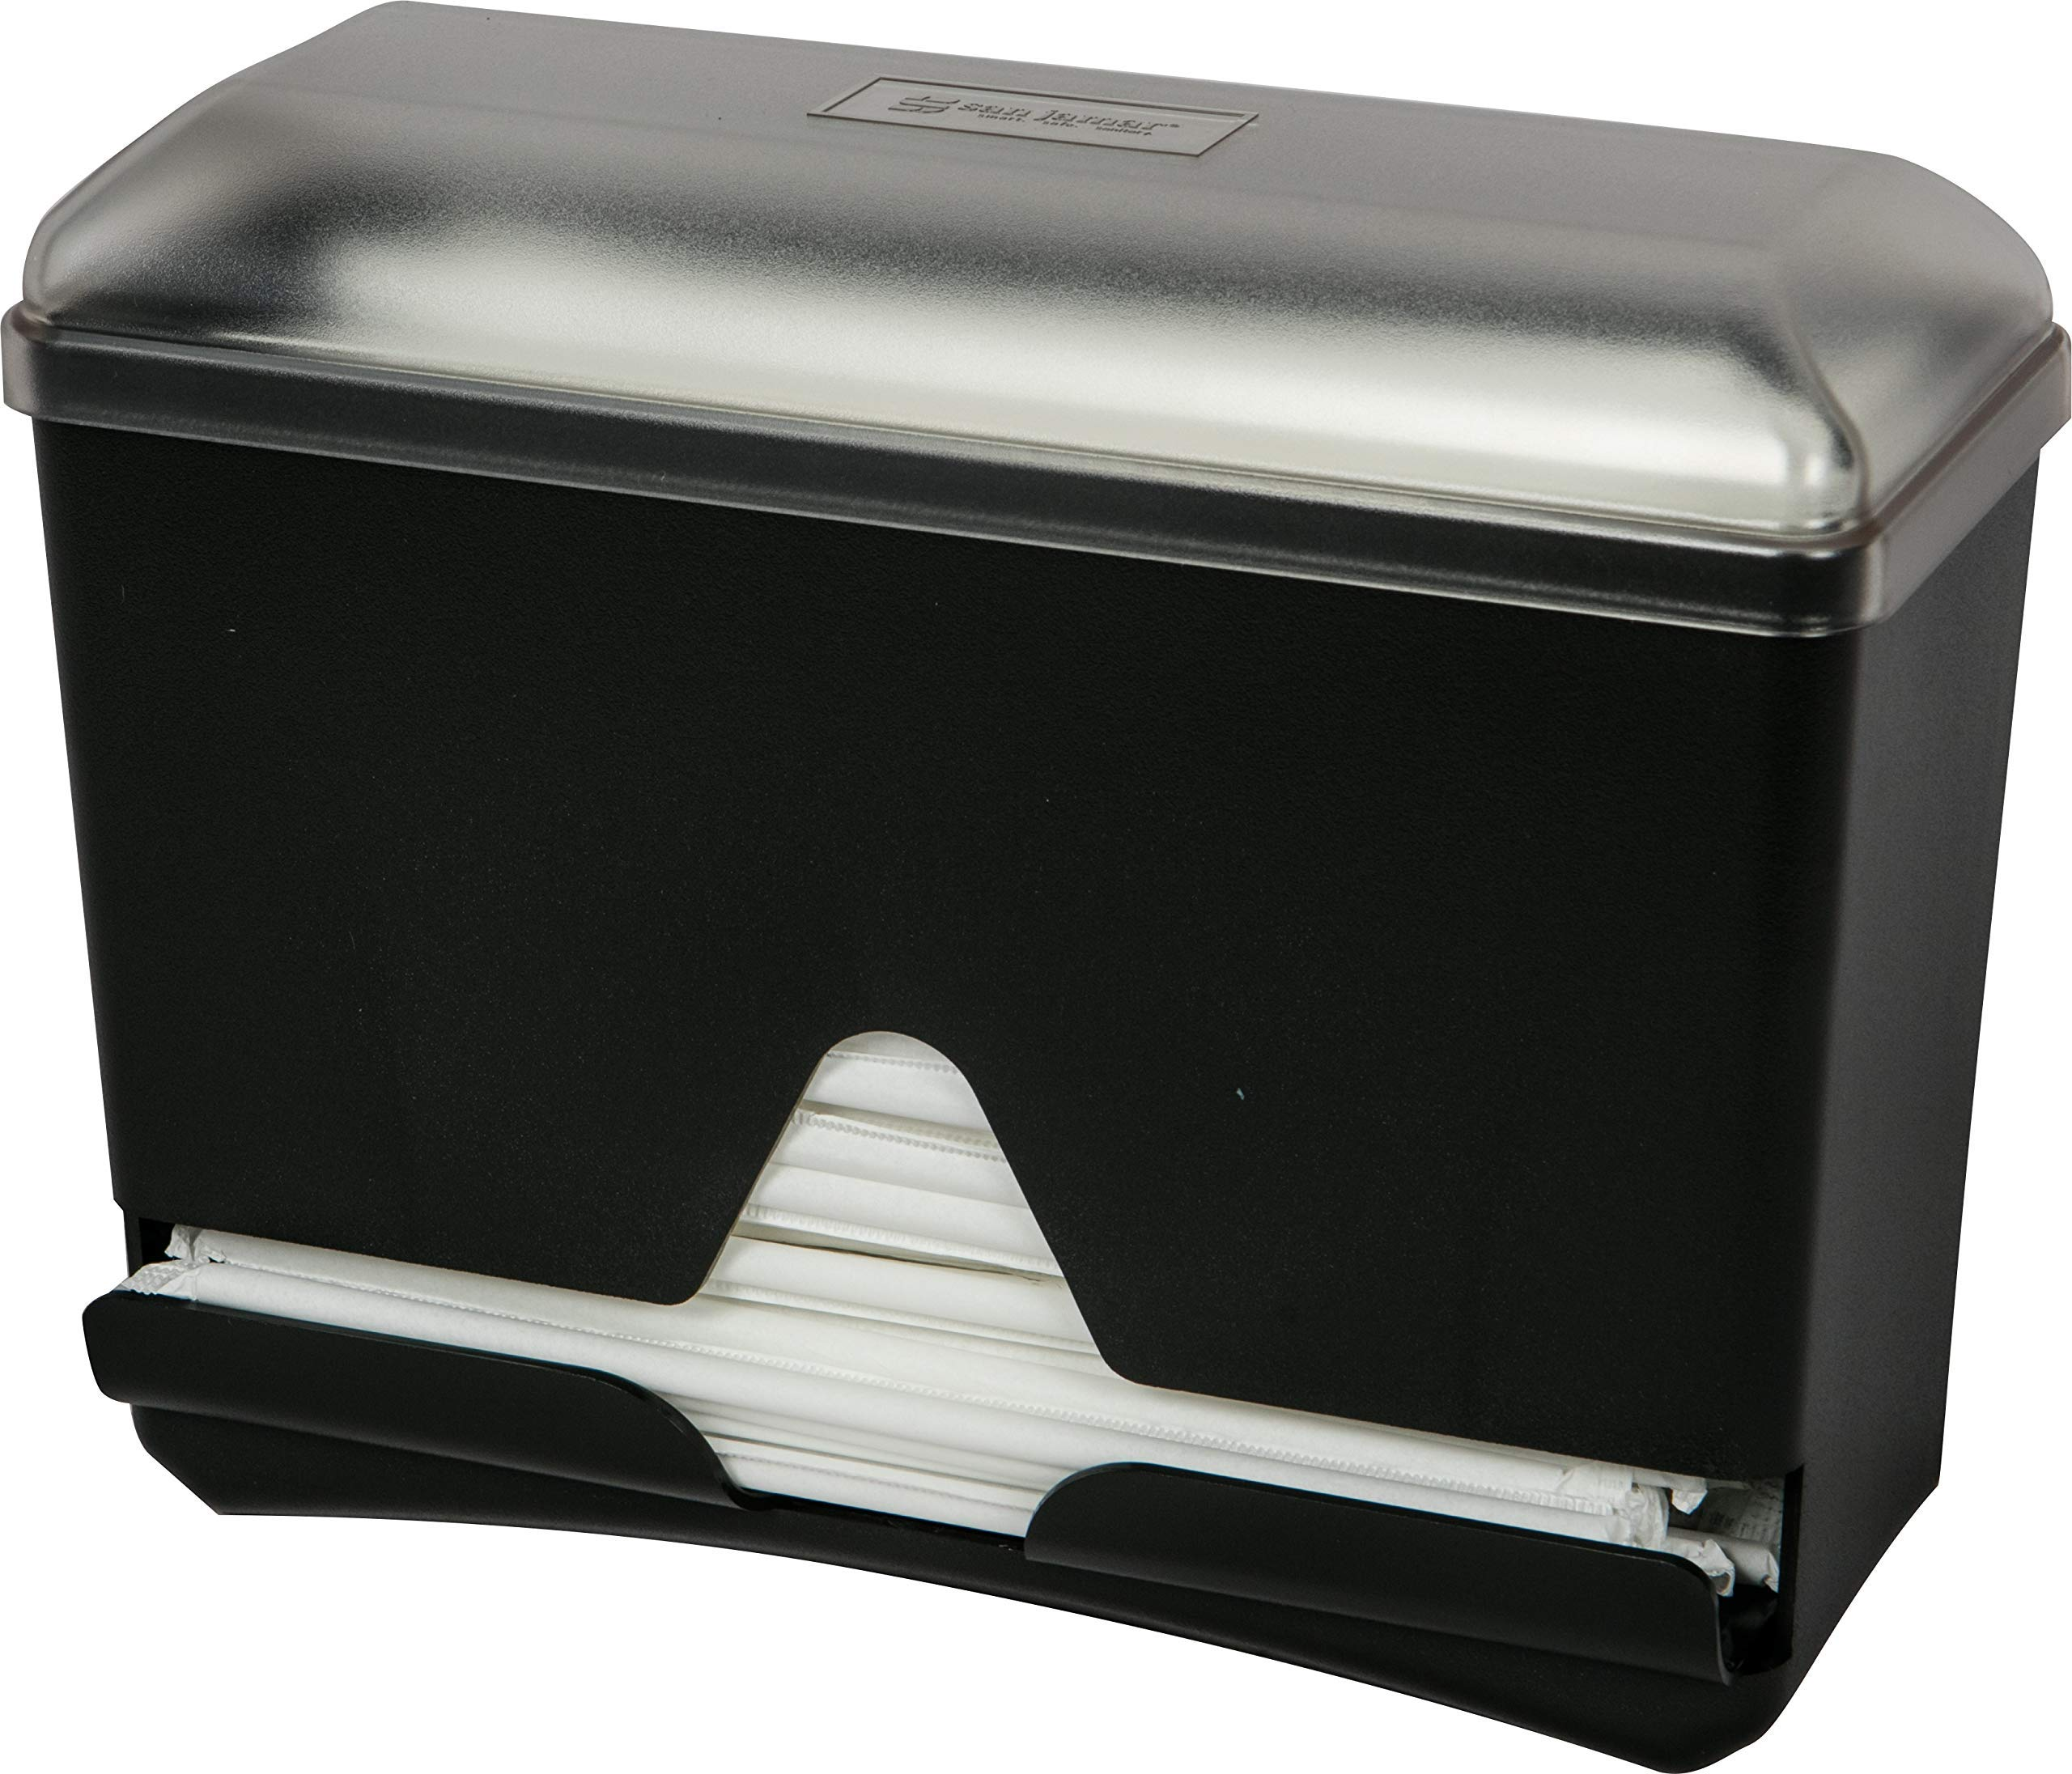 San Jamar ST250 Countertop Bulk Straw Dispenser, 250 Wrapped Straw Capacity, Black (Renewed) by San Jamar